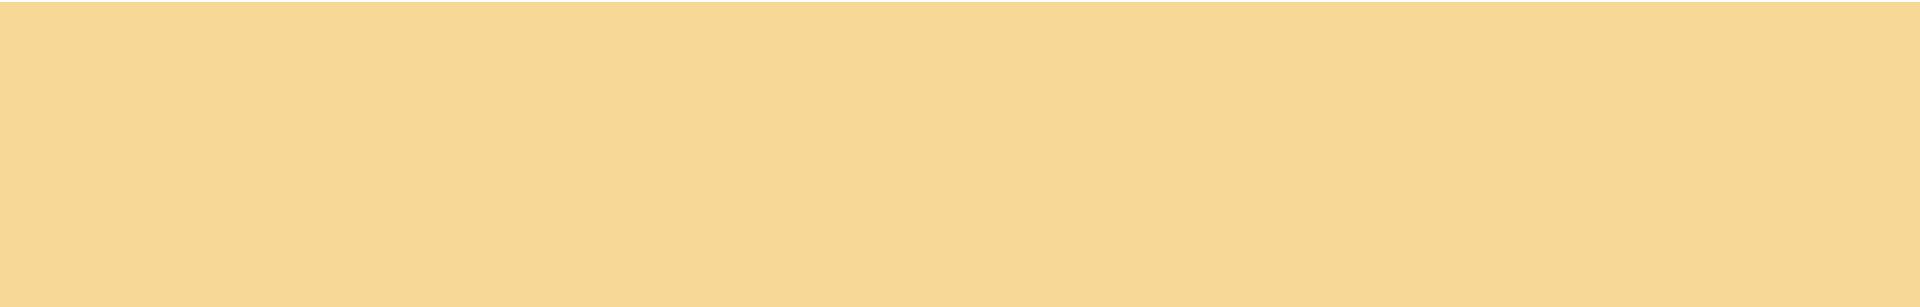 border-sherlock-top